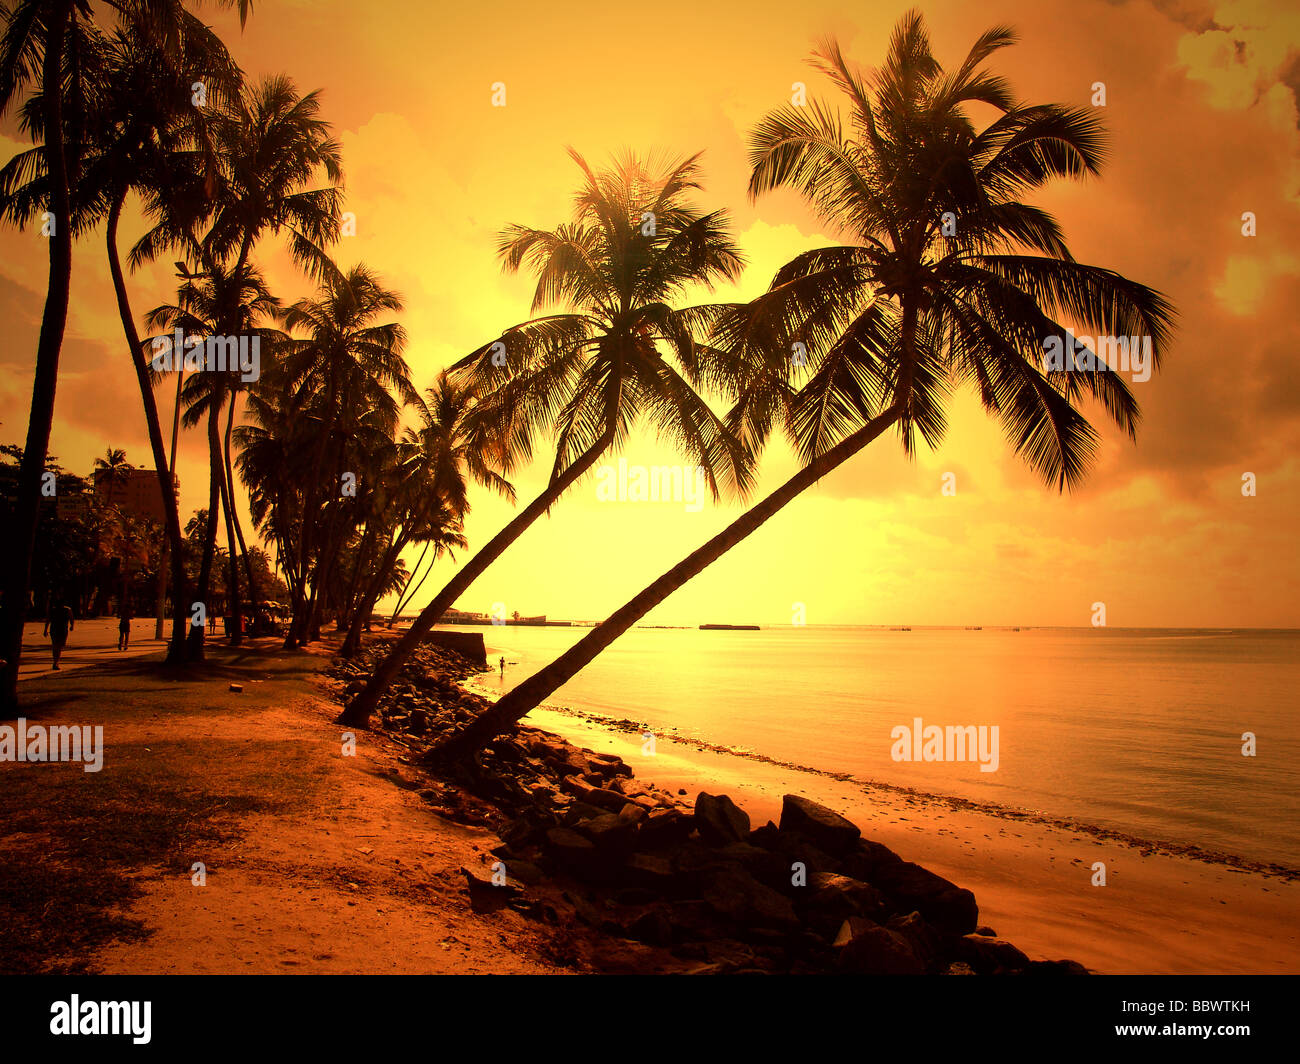 sunset light falling at alagoas beach paradise view brazil Stock Photo